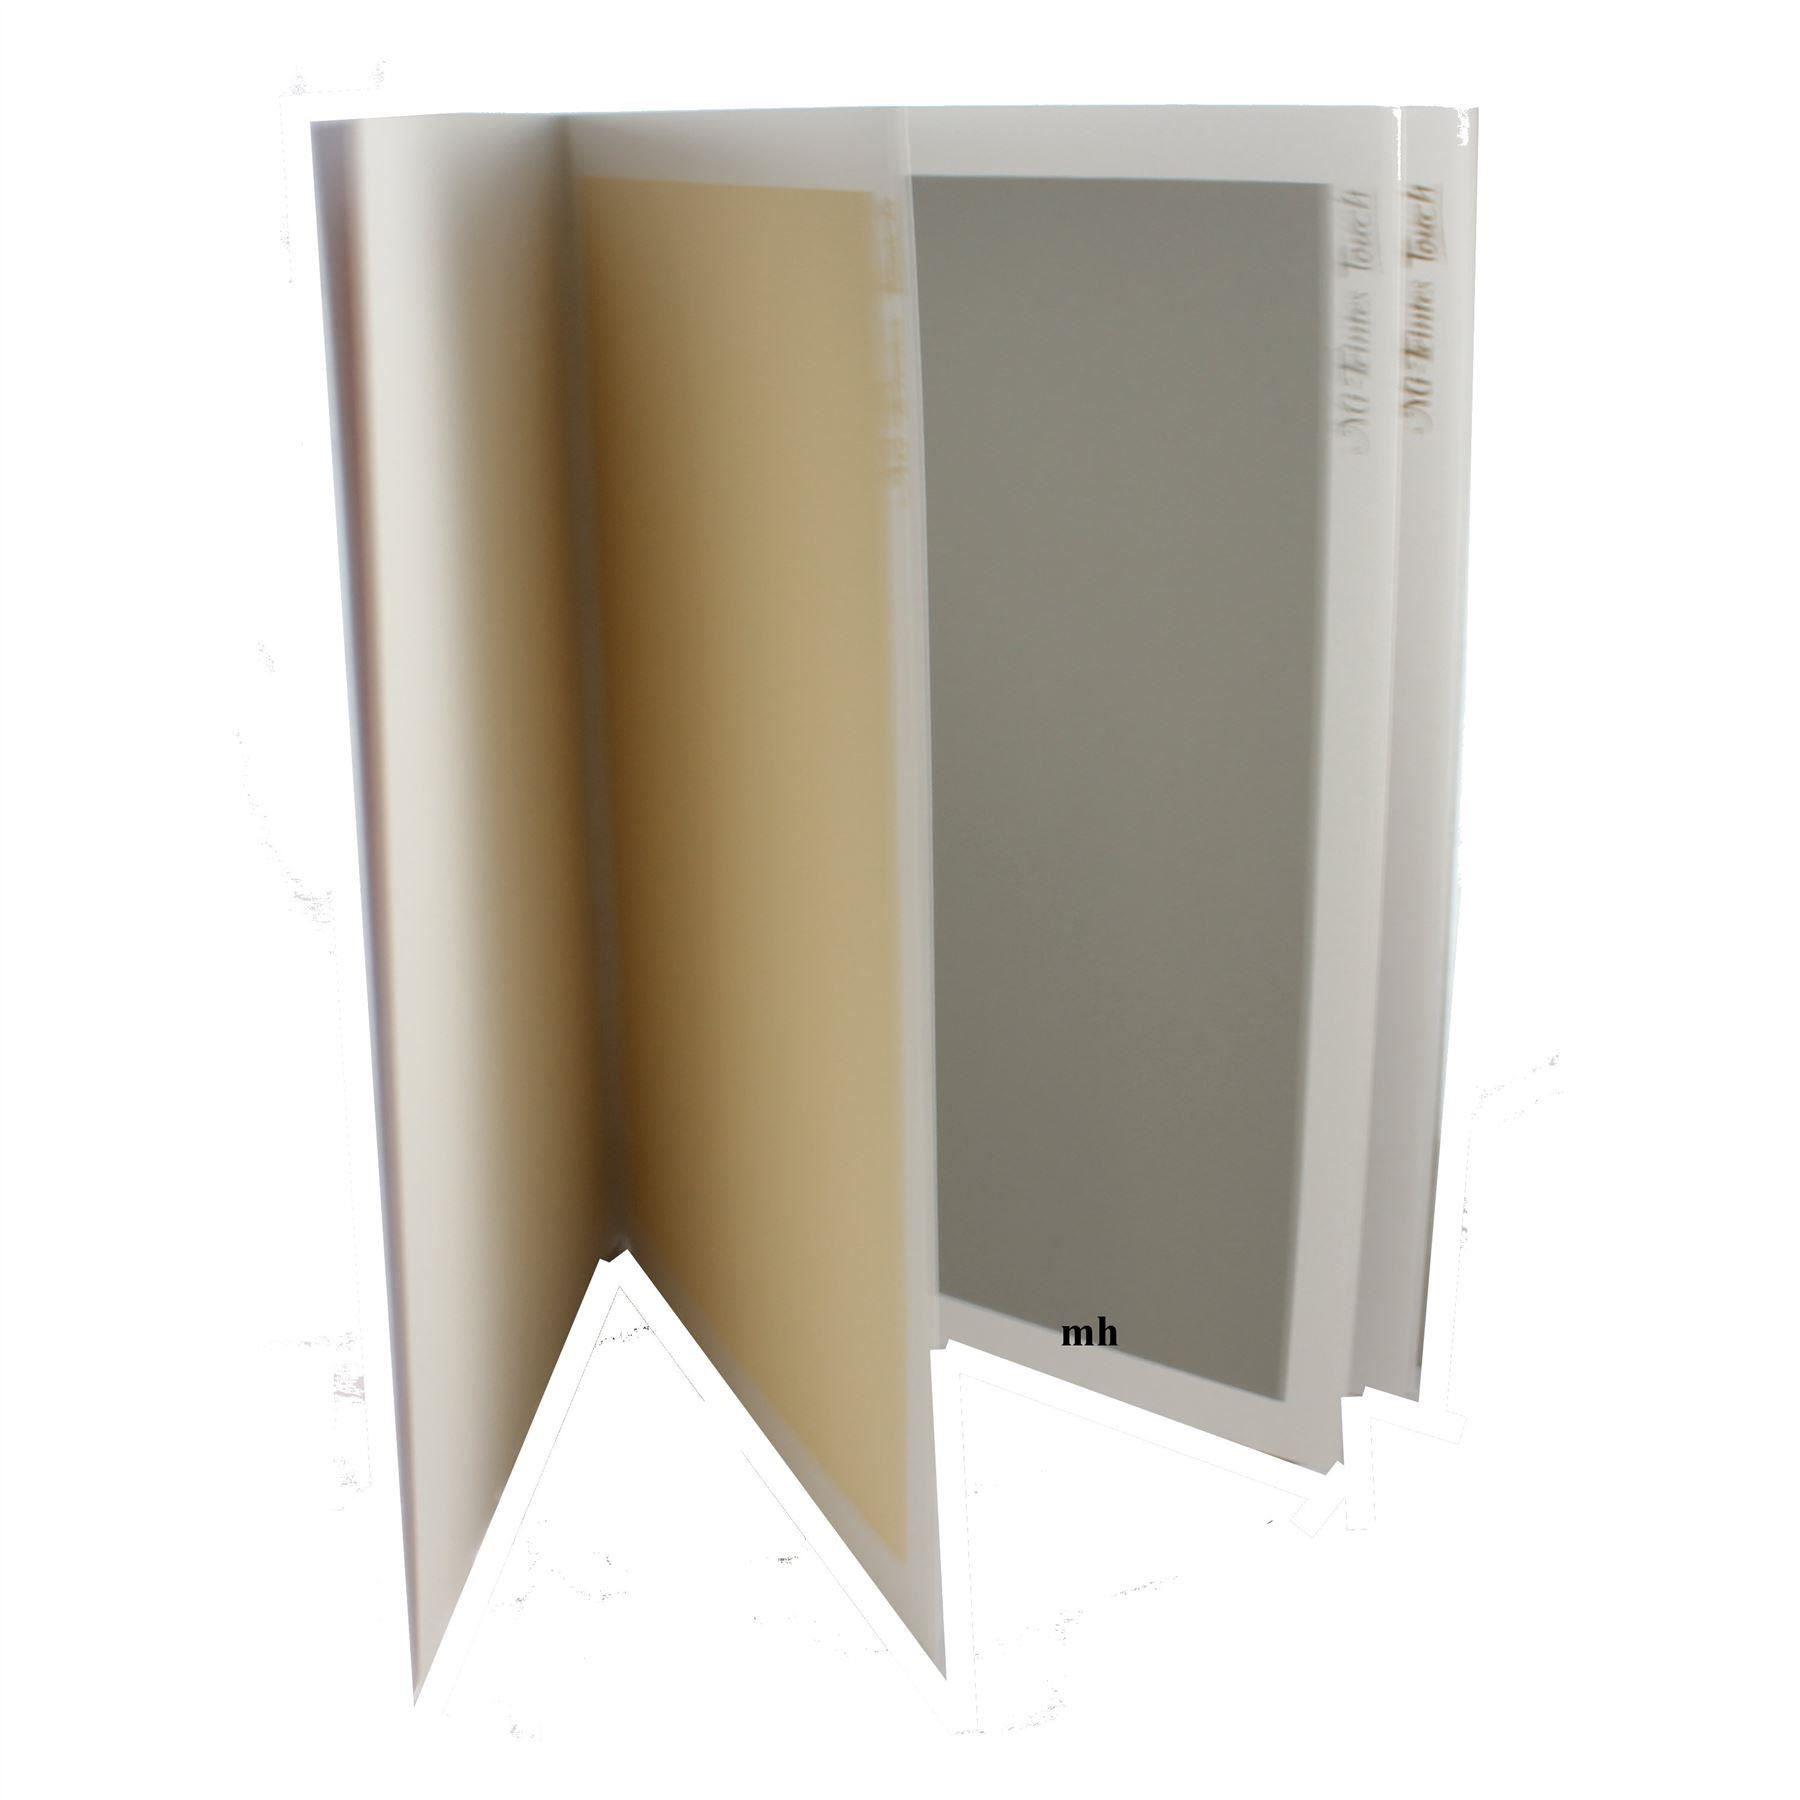 sand-paper-texture-pastel-paper-canson-Mi-Teintes-touch-soft-pastel-pad thumbnail 8